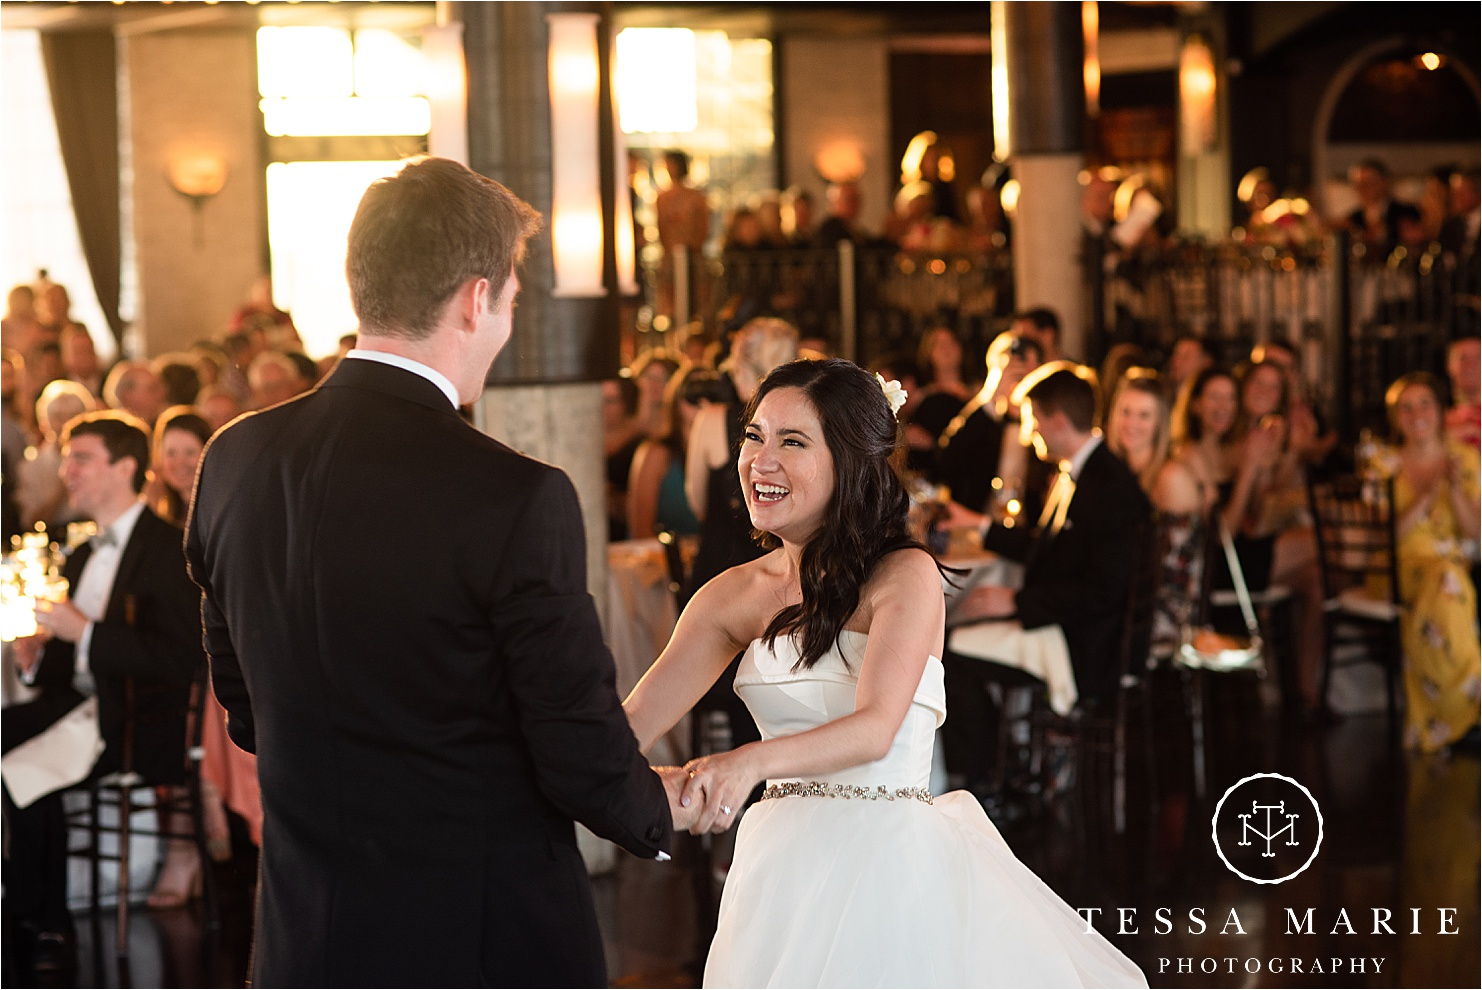 Tessa_marie_weddings_houston_wedding_photographer_The_astorian_0151.jpg